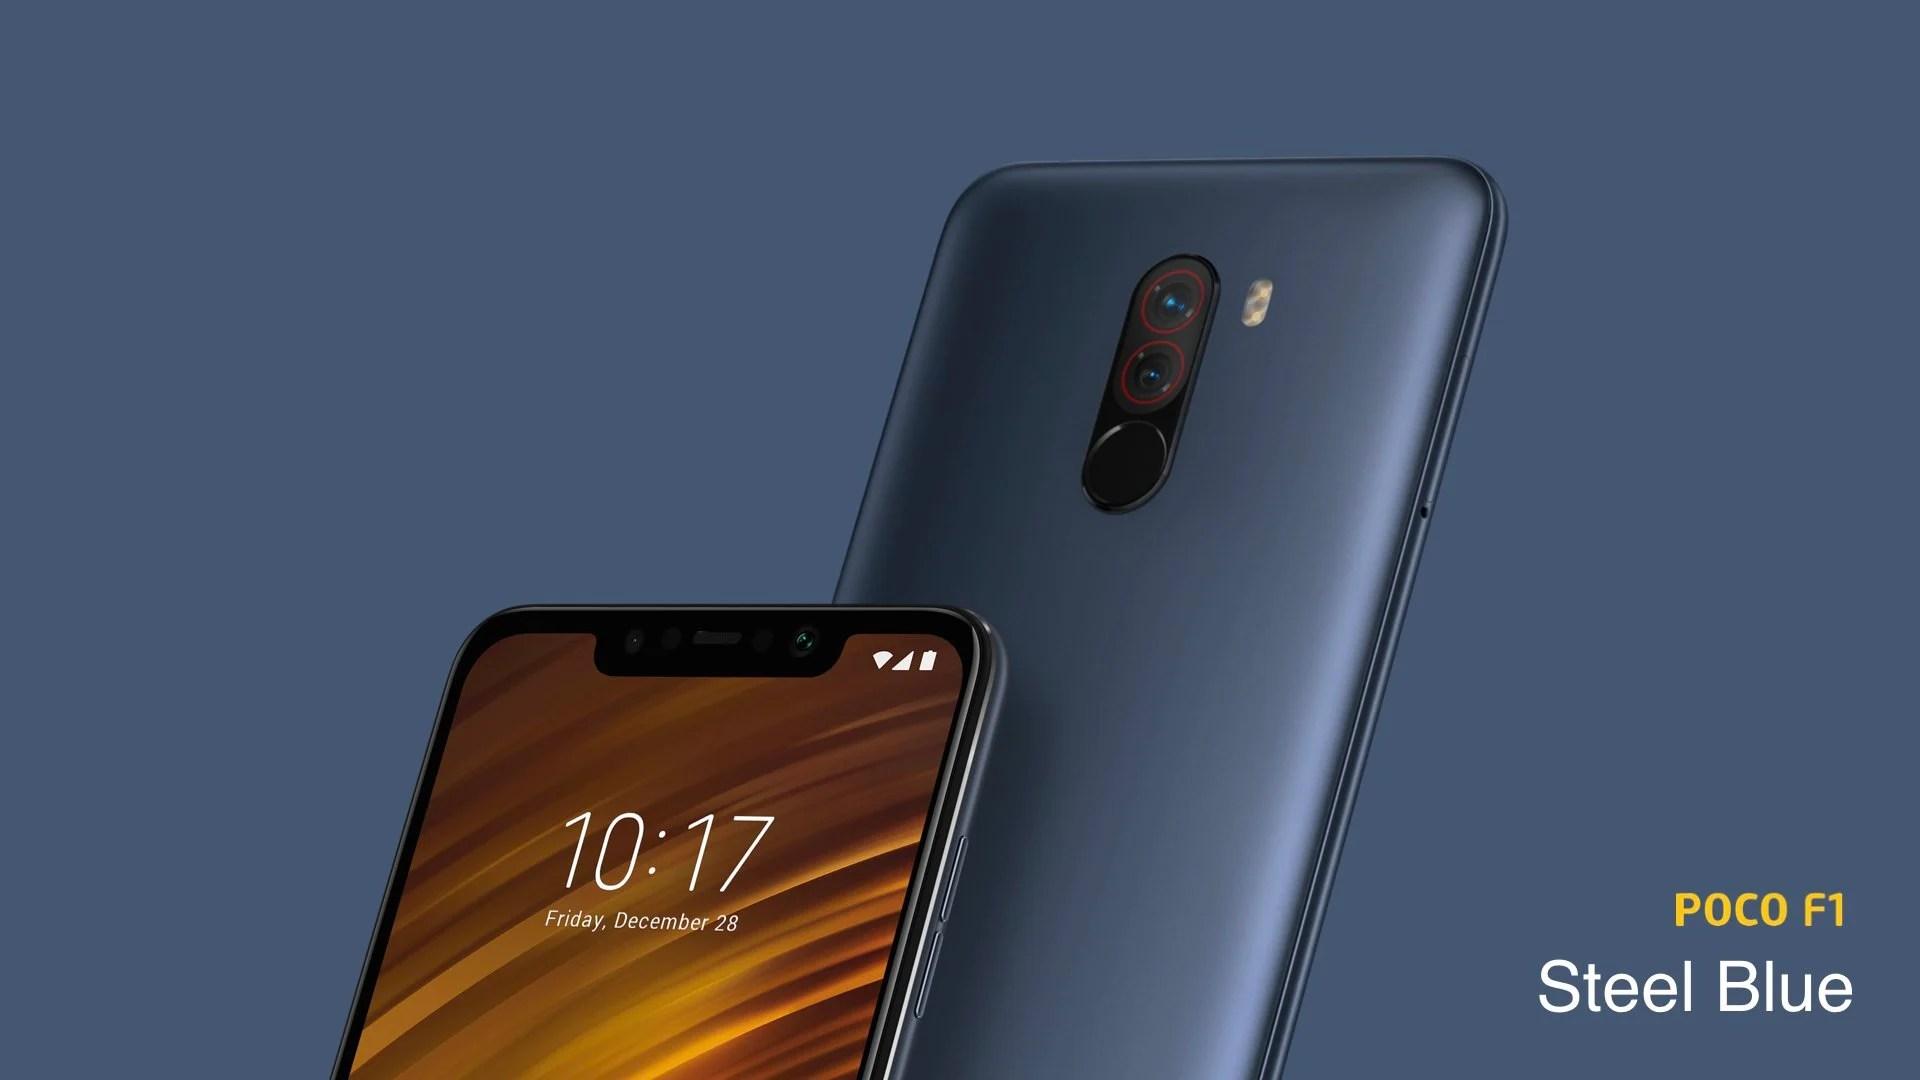 Le Poco Pocophone F1 de Xiaomi est officiel : le smartphone pragmatique